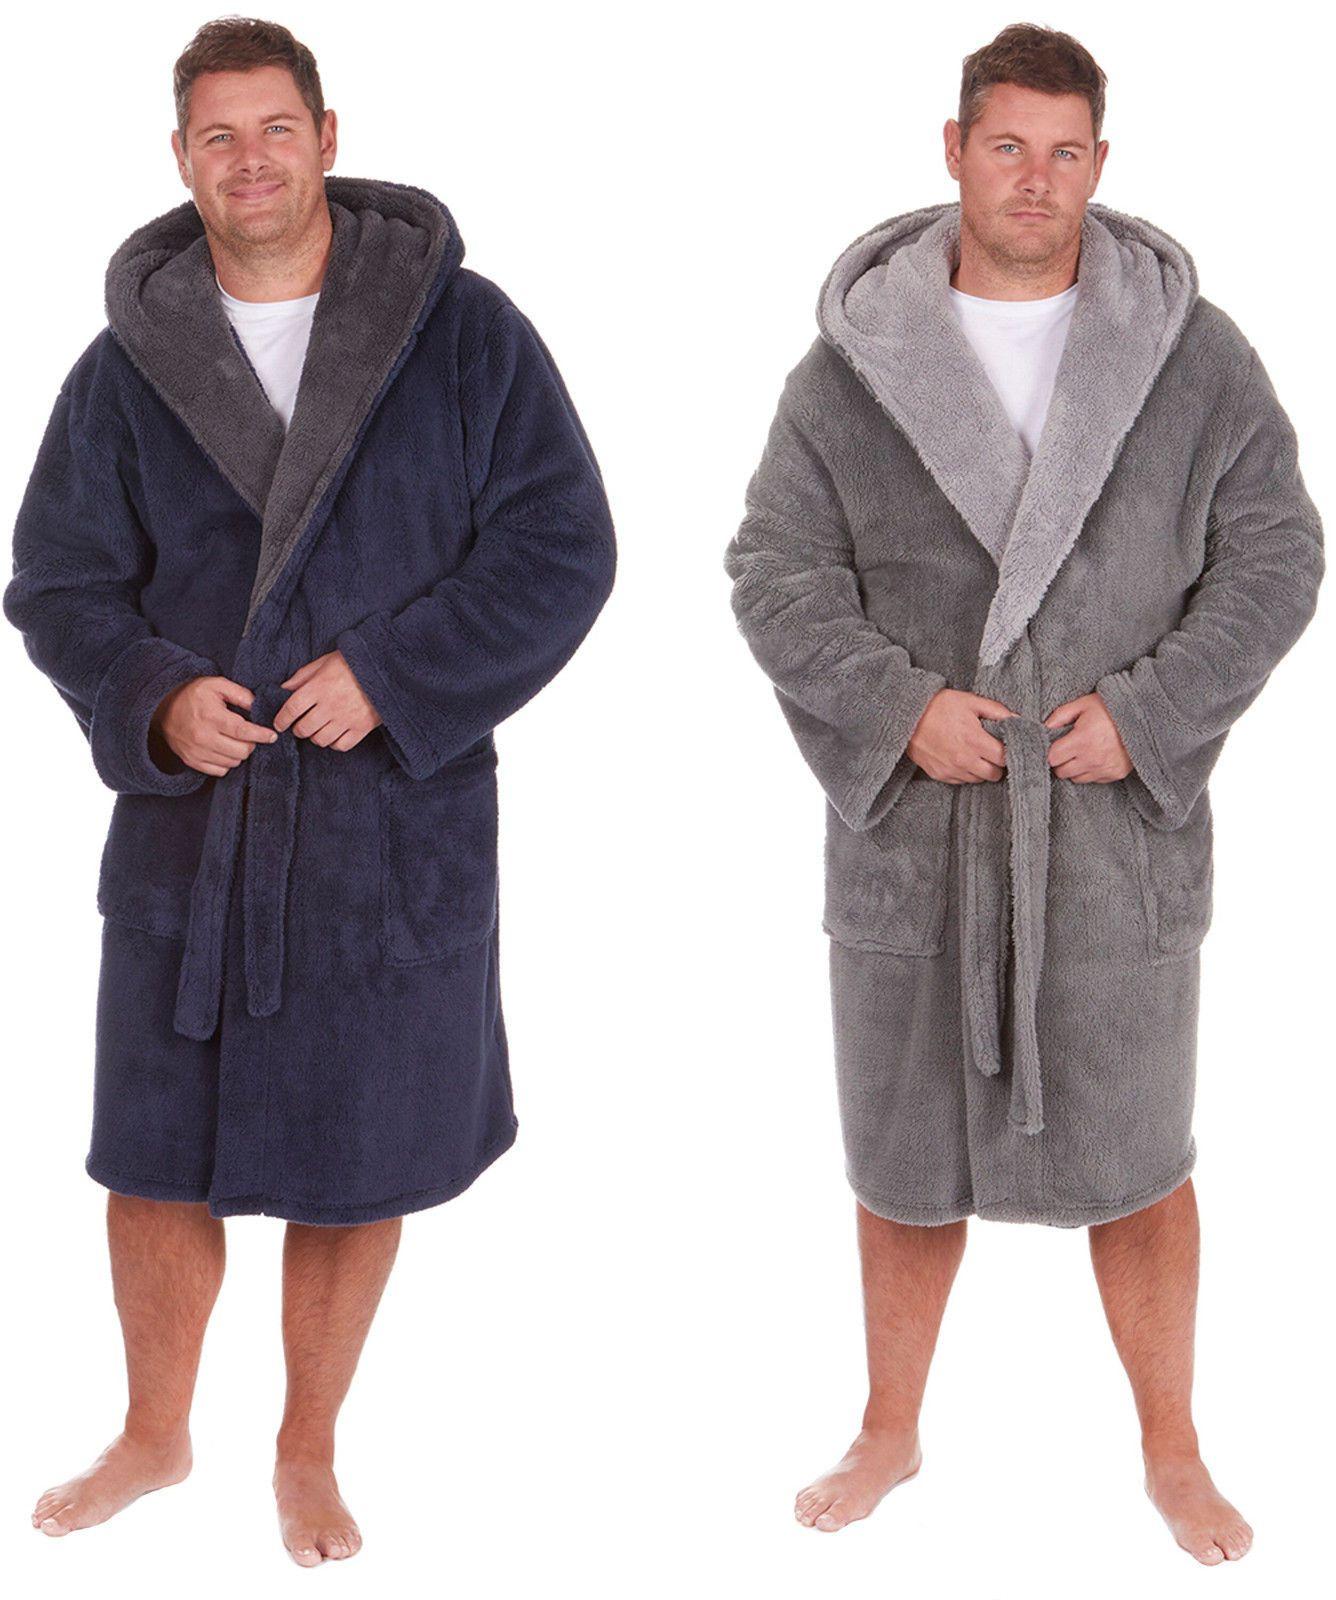 online sneakler 49337 a1788 mens soft dressing gown pinterest.com ...